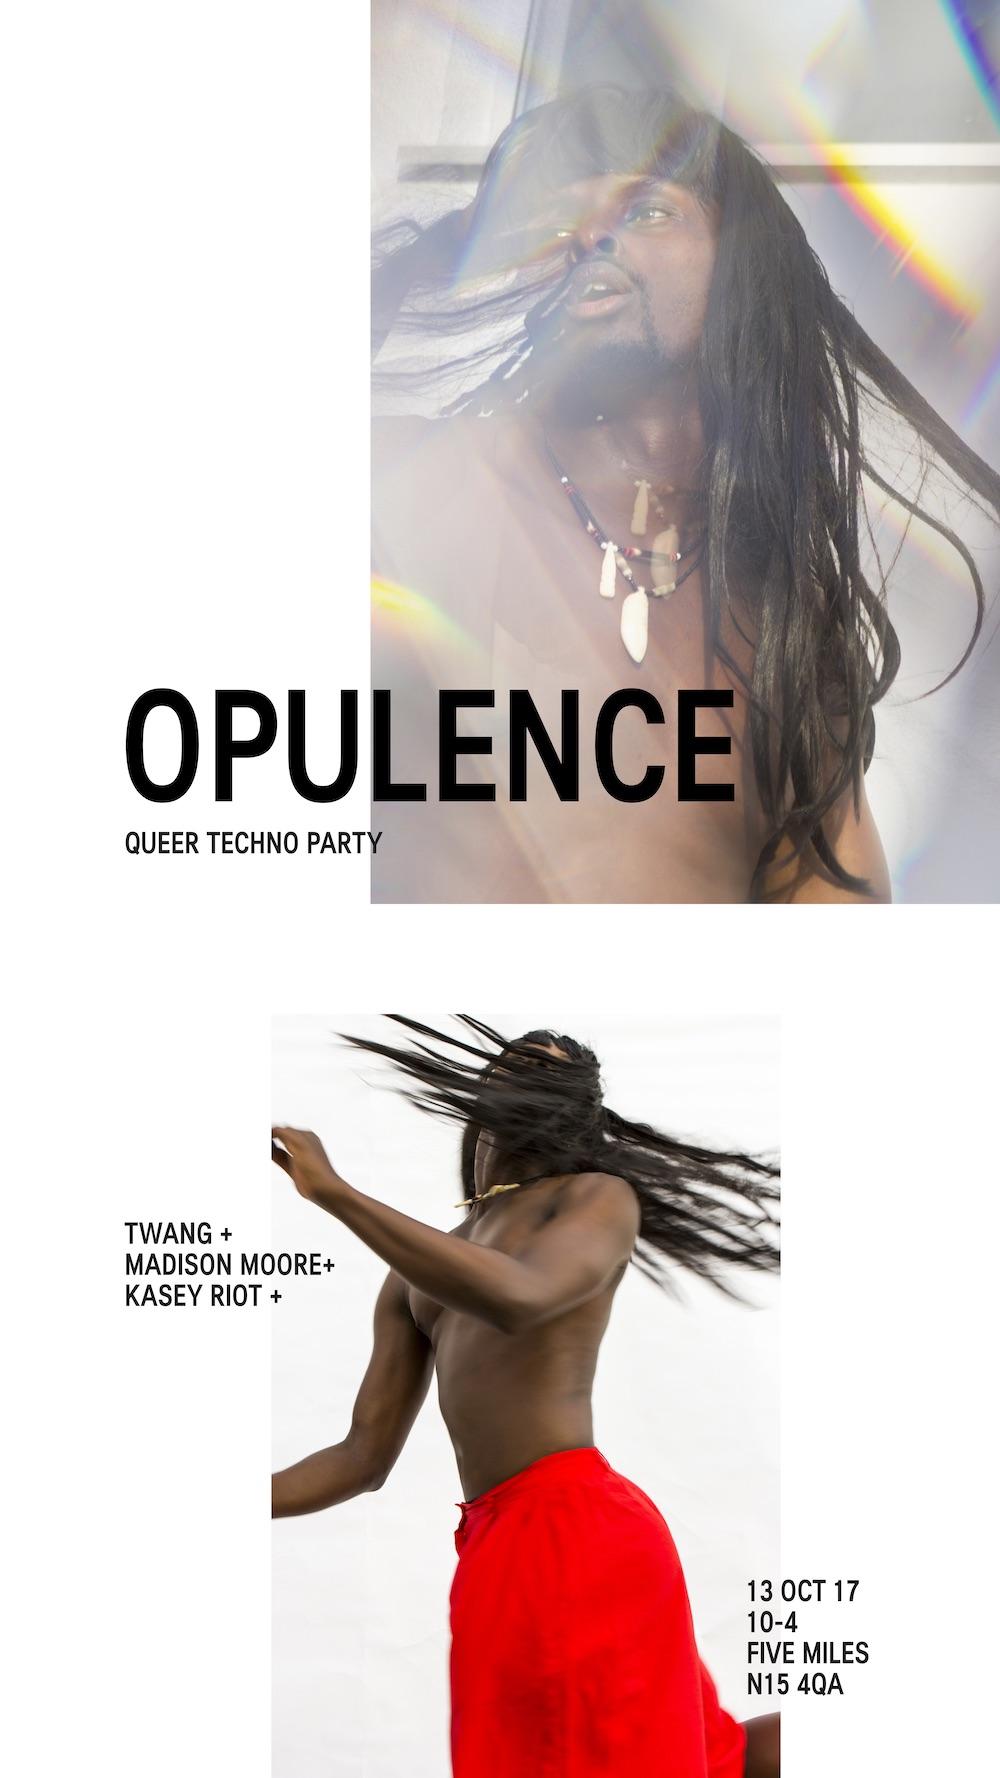 Opulence-X-Five-Miles-RA-banner-portrait.jpg